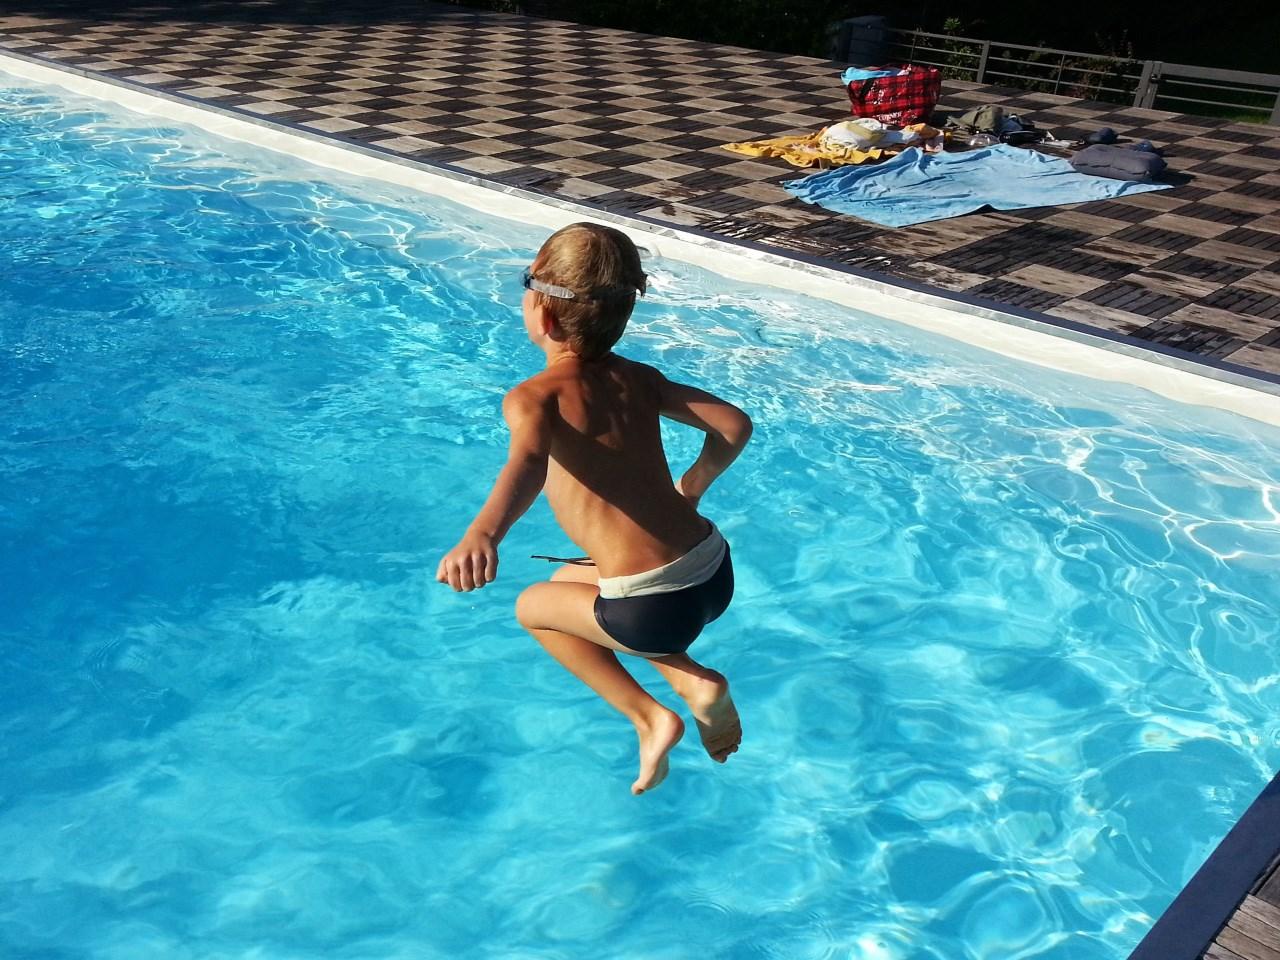 swimsuit_1528744605350.jpg